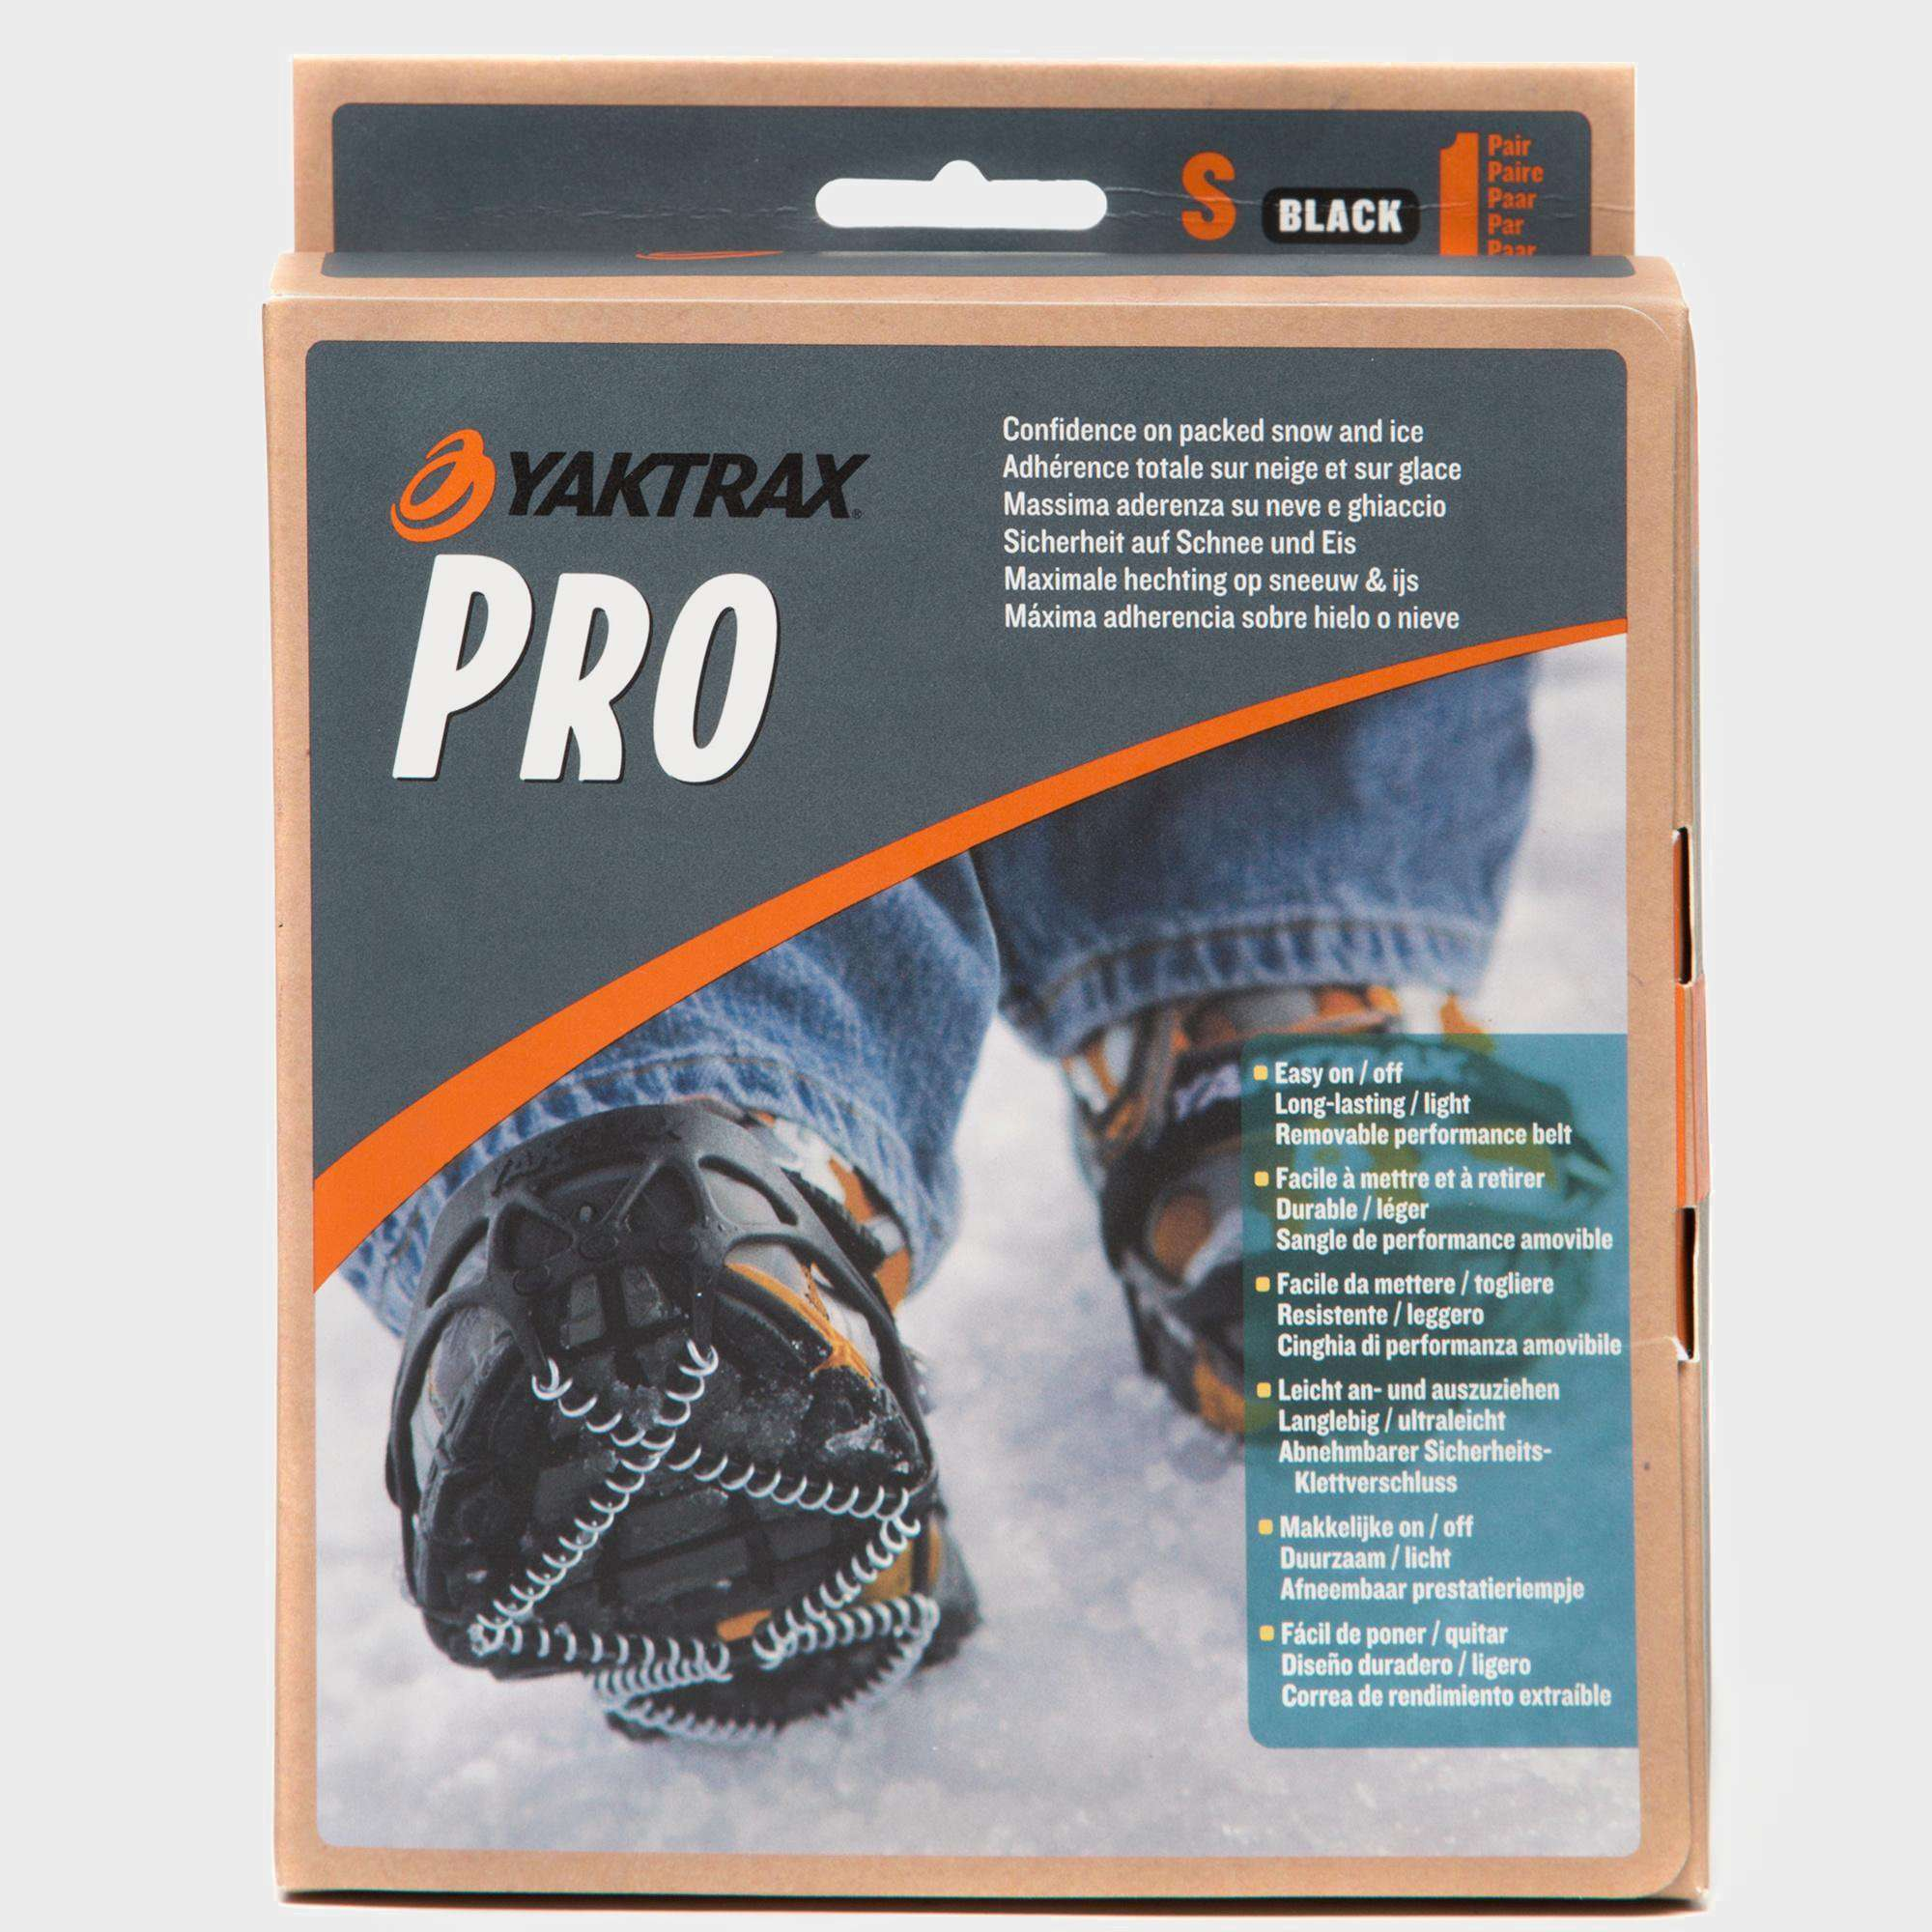 YAKTRAX Pro Ice Grips